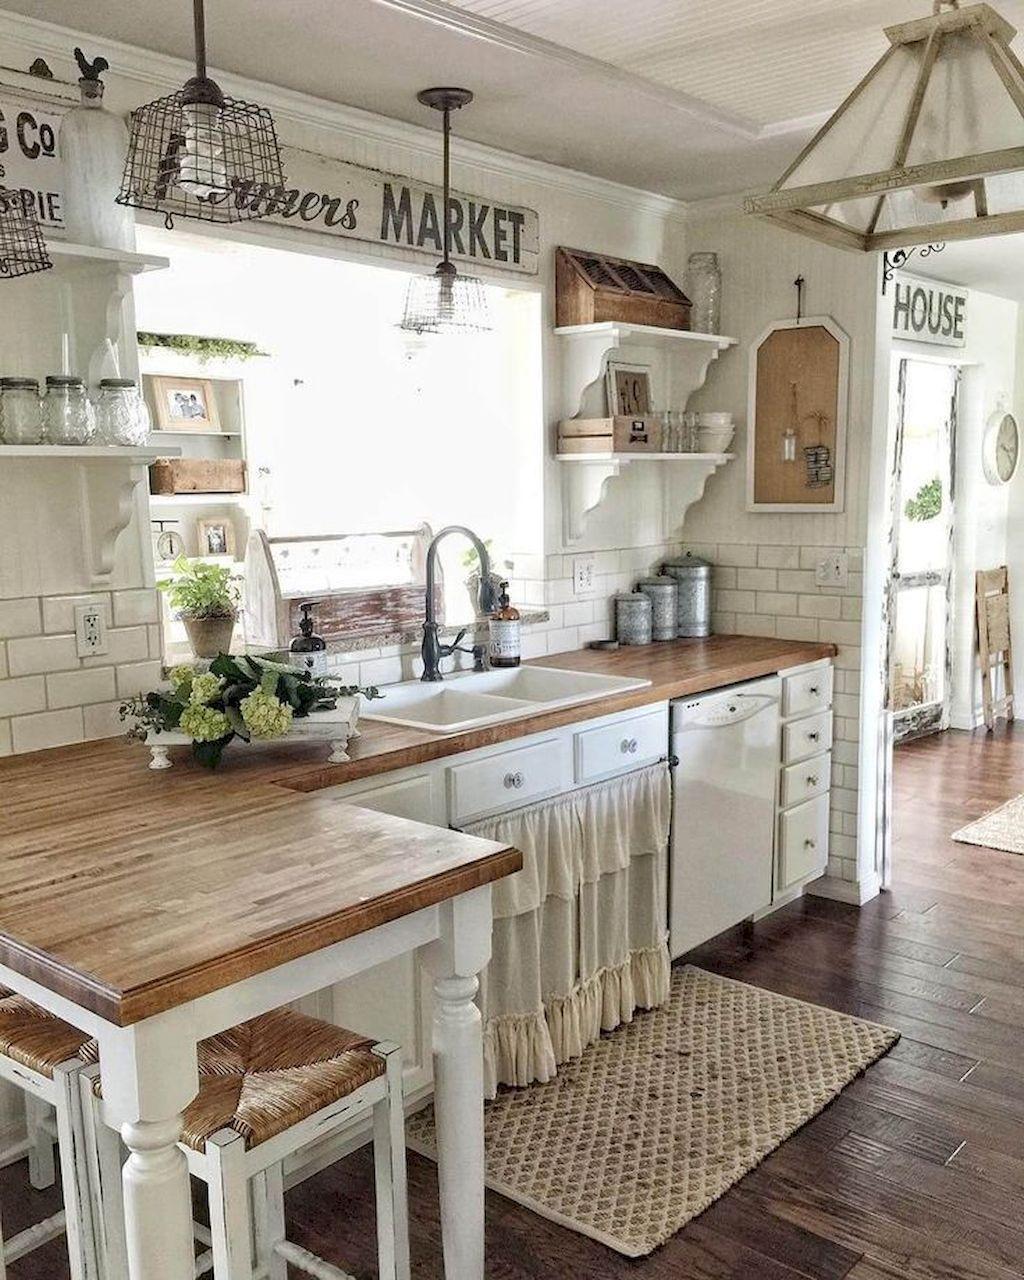 13 Modern Rustic Farmhouse Kitchen Cabinets Ideas White Kitchen Remodeling Kitchen Remodel Small Farmhouse Kitchen Remodel